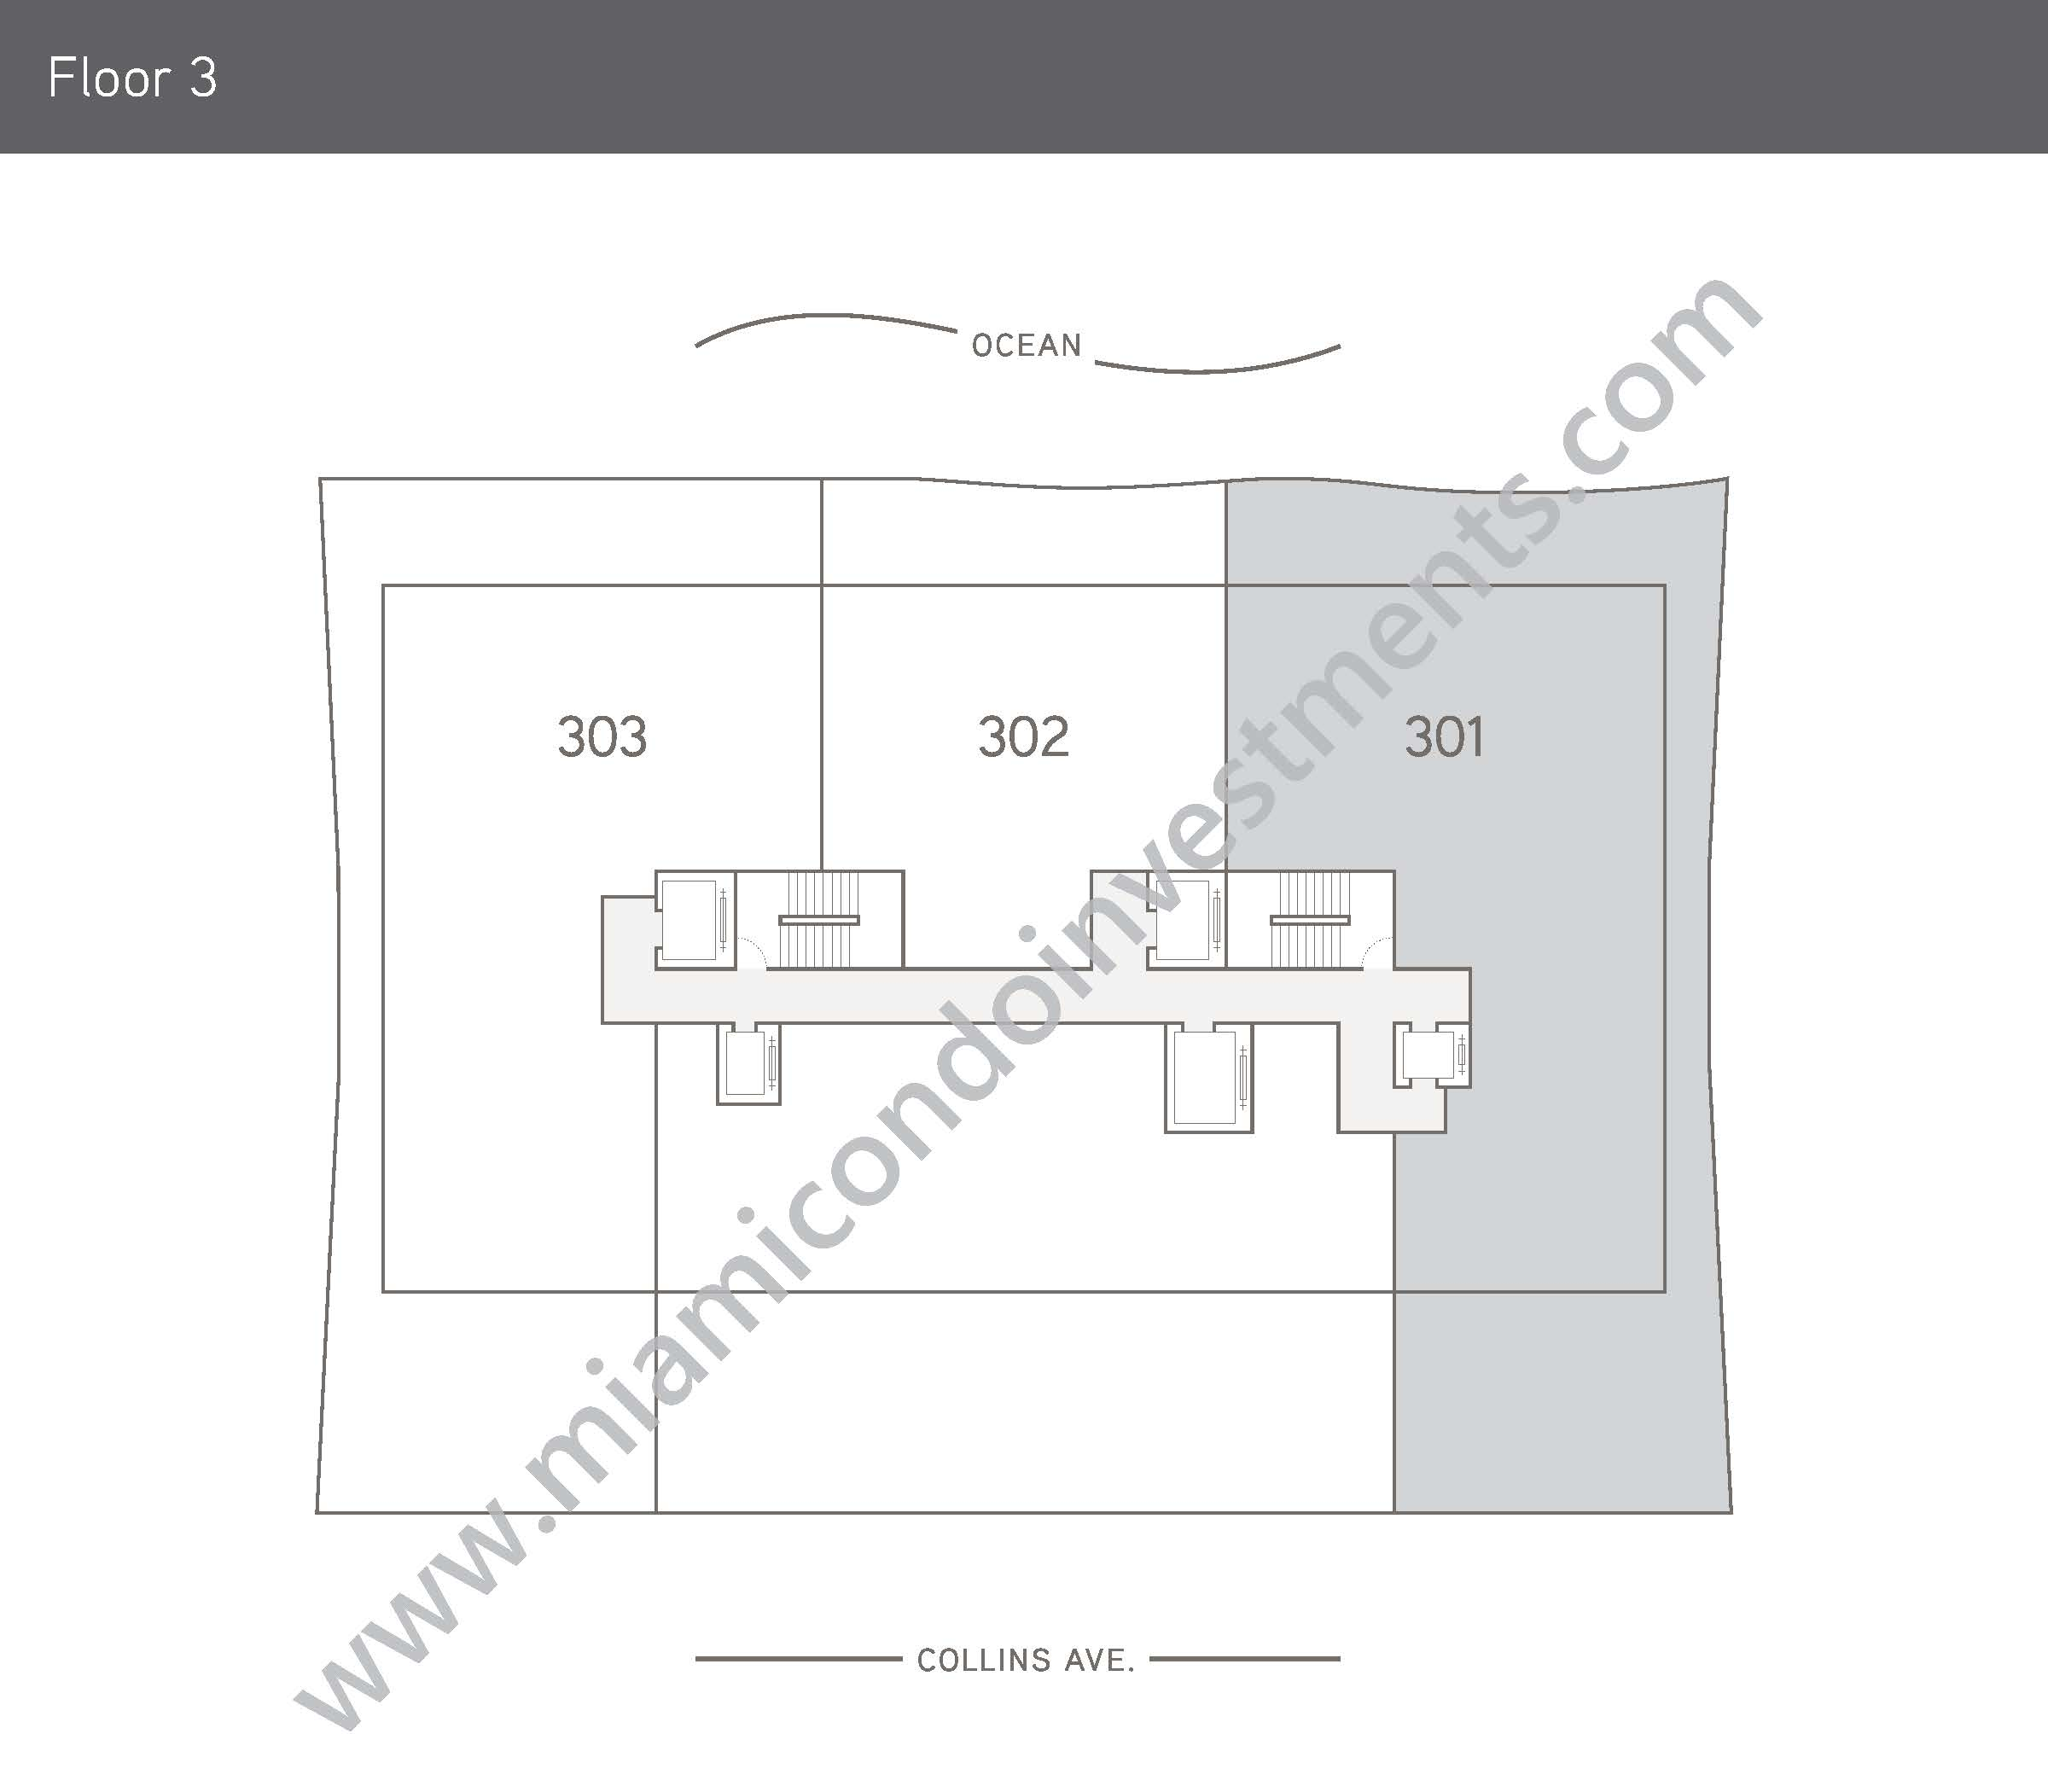 Floorplans 1 - Floor 3